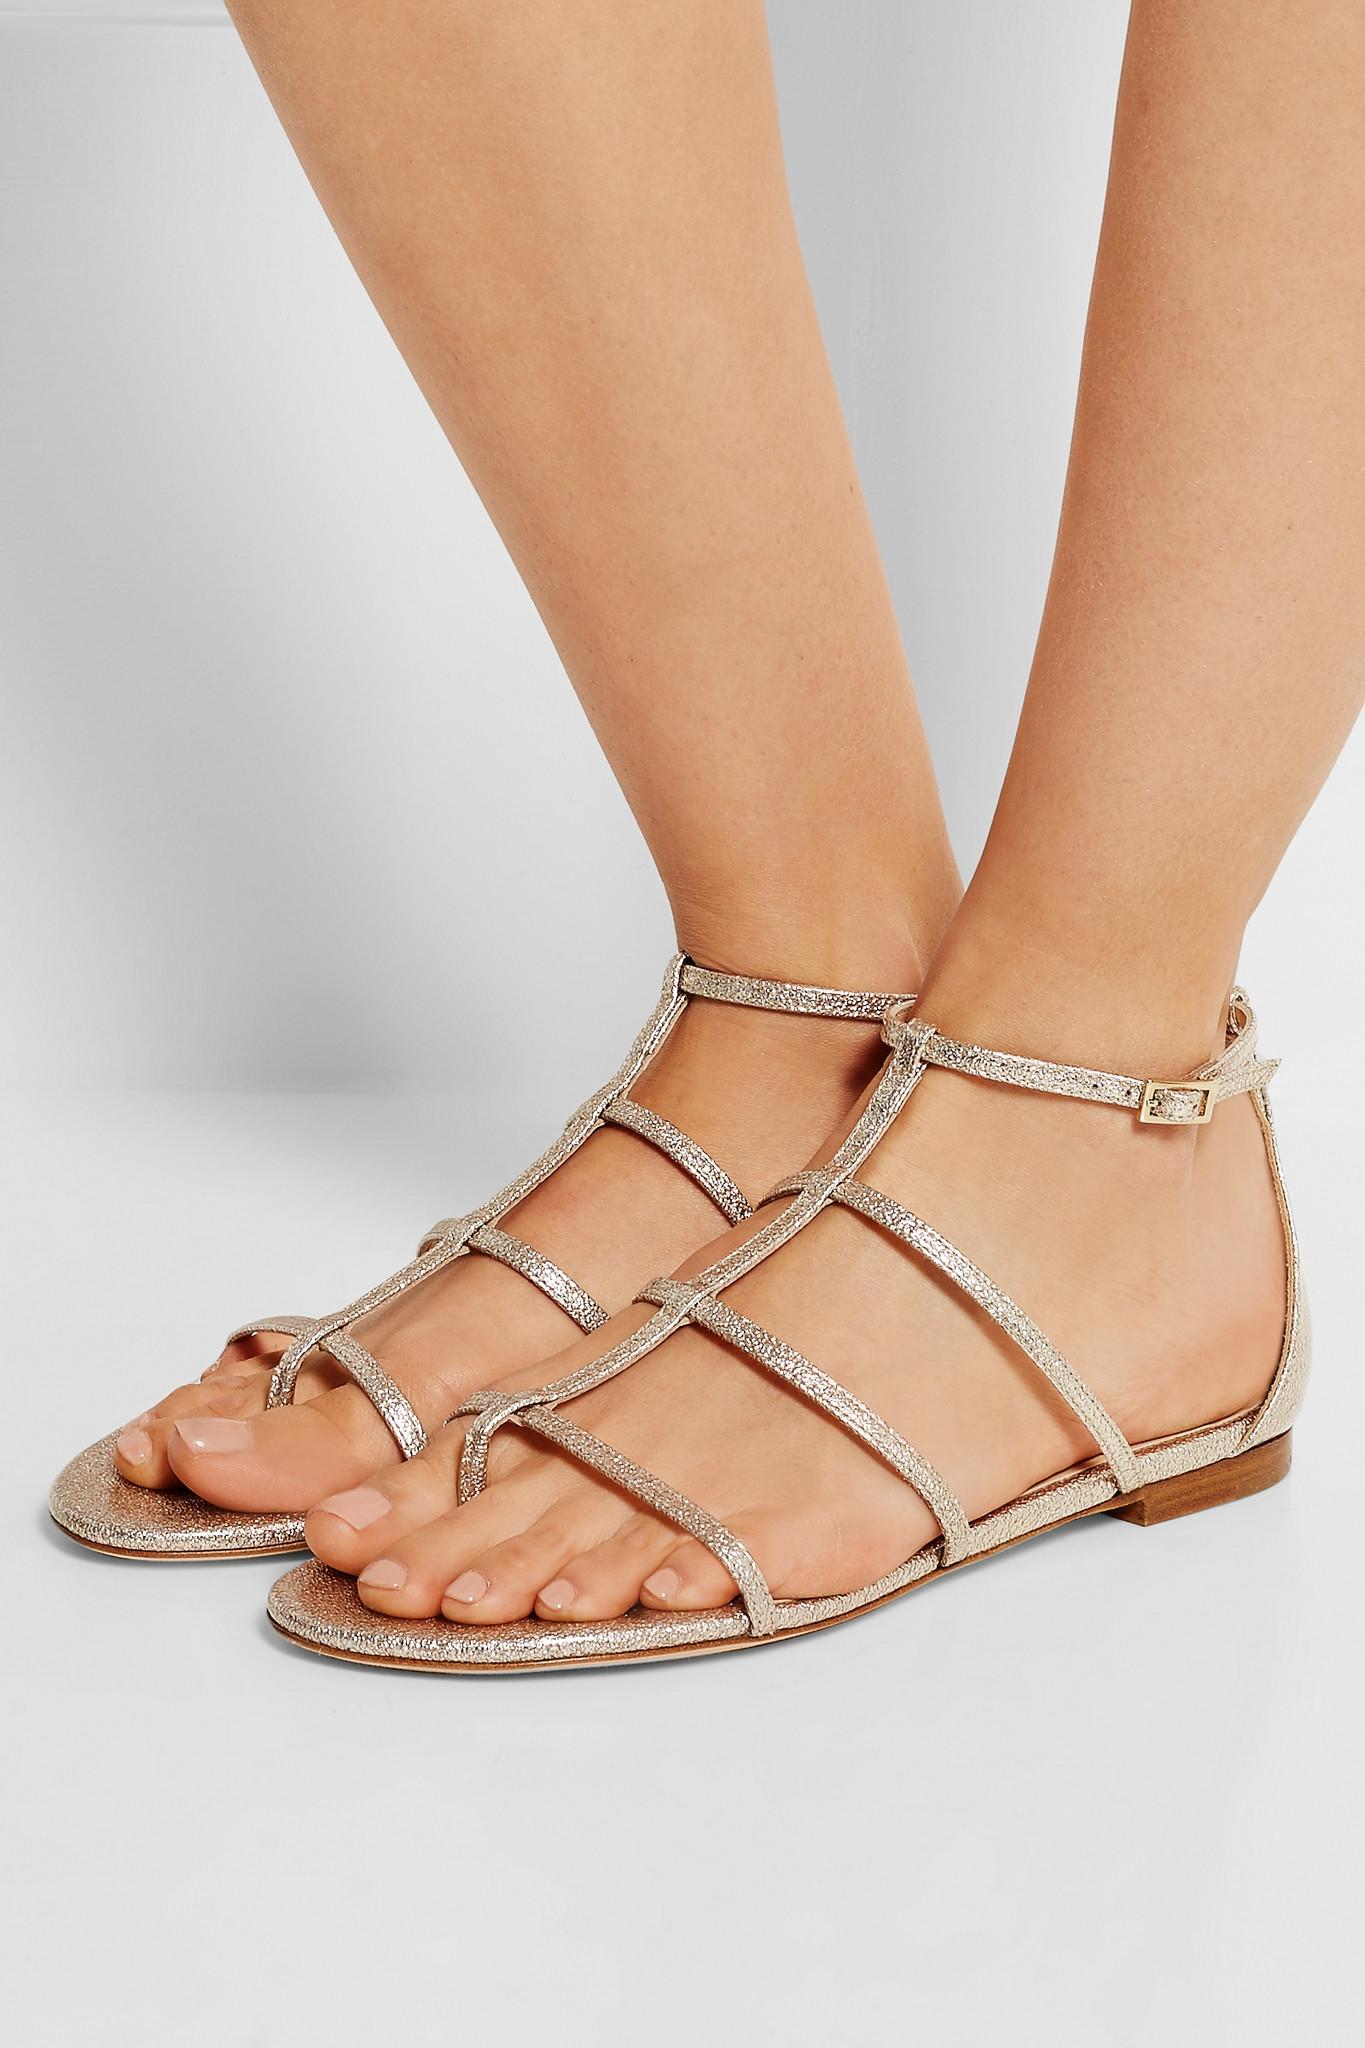 4ccb567f2336 Jimmy Choo Dory Metallic Textured-leather Sandals in Metallic - Lyst